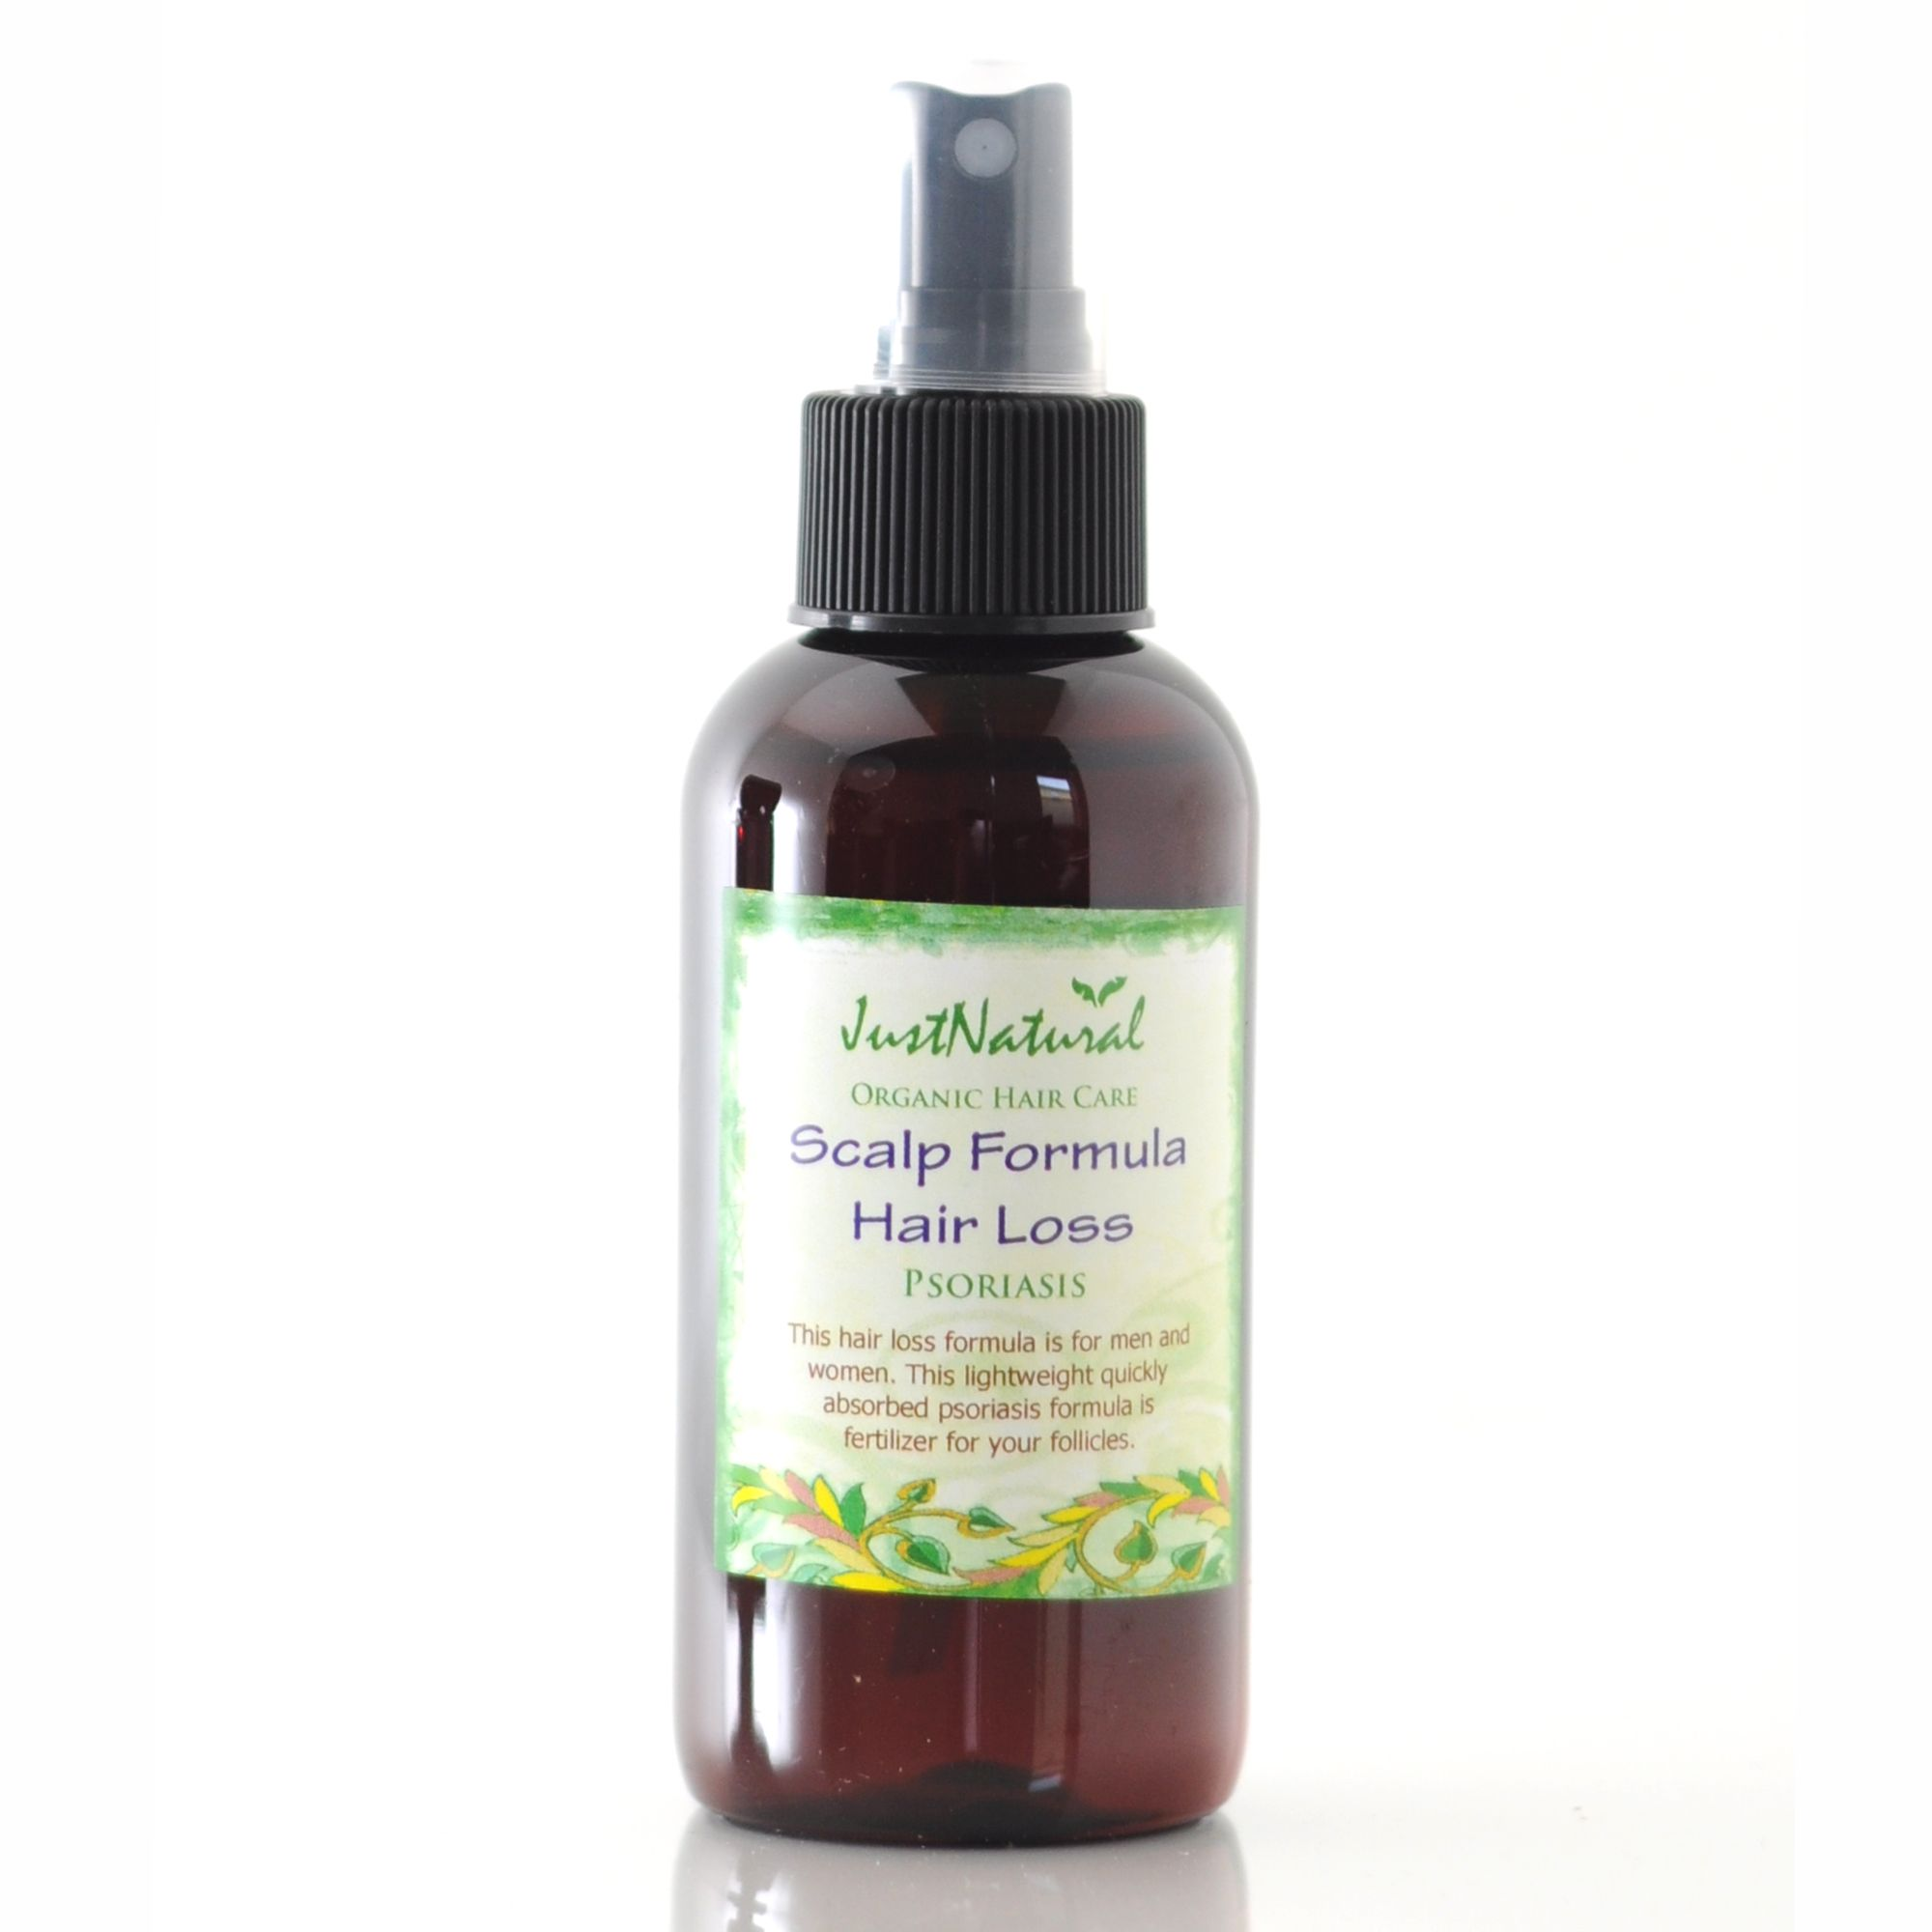 Psoriasis Scalp hair loss remedy